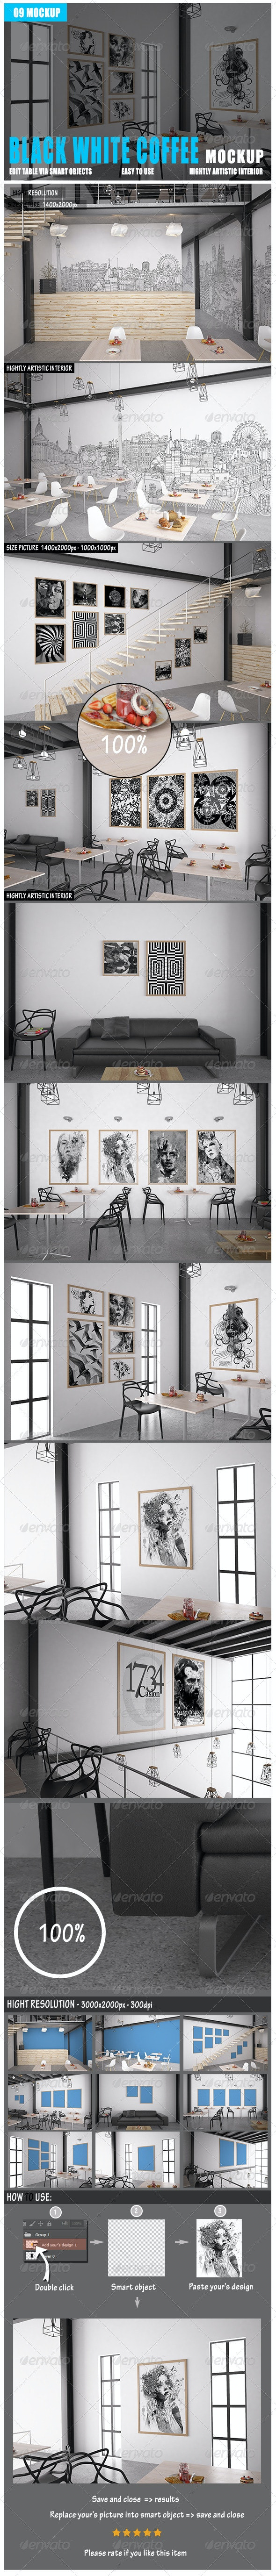 Coffee Black White Mockup - Posters Print